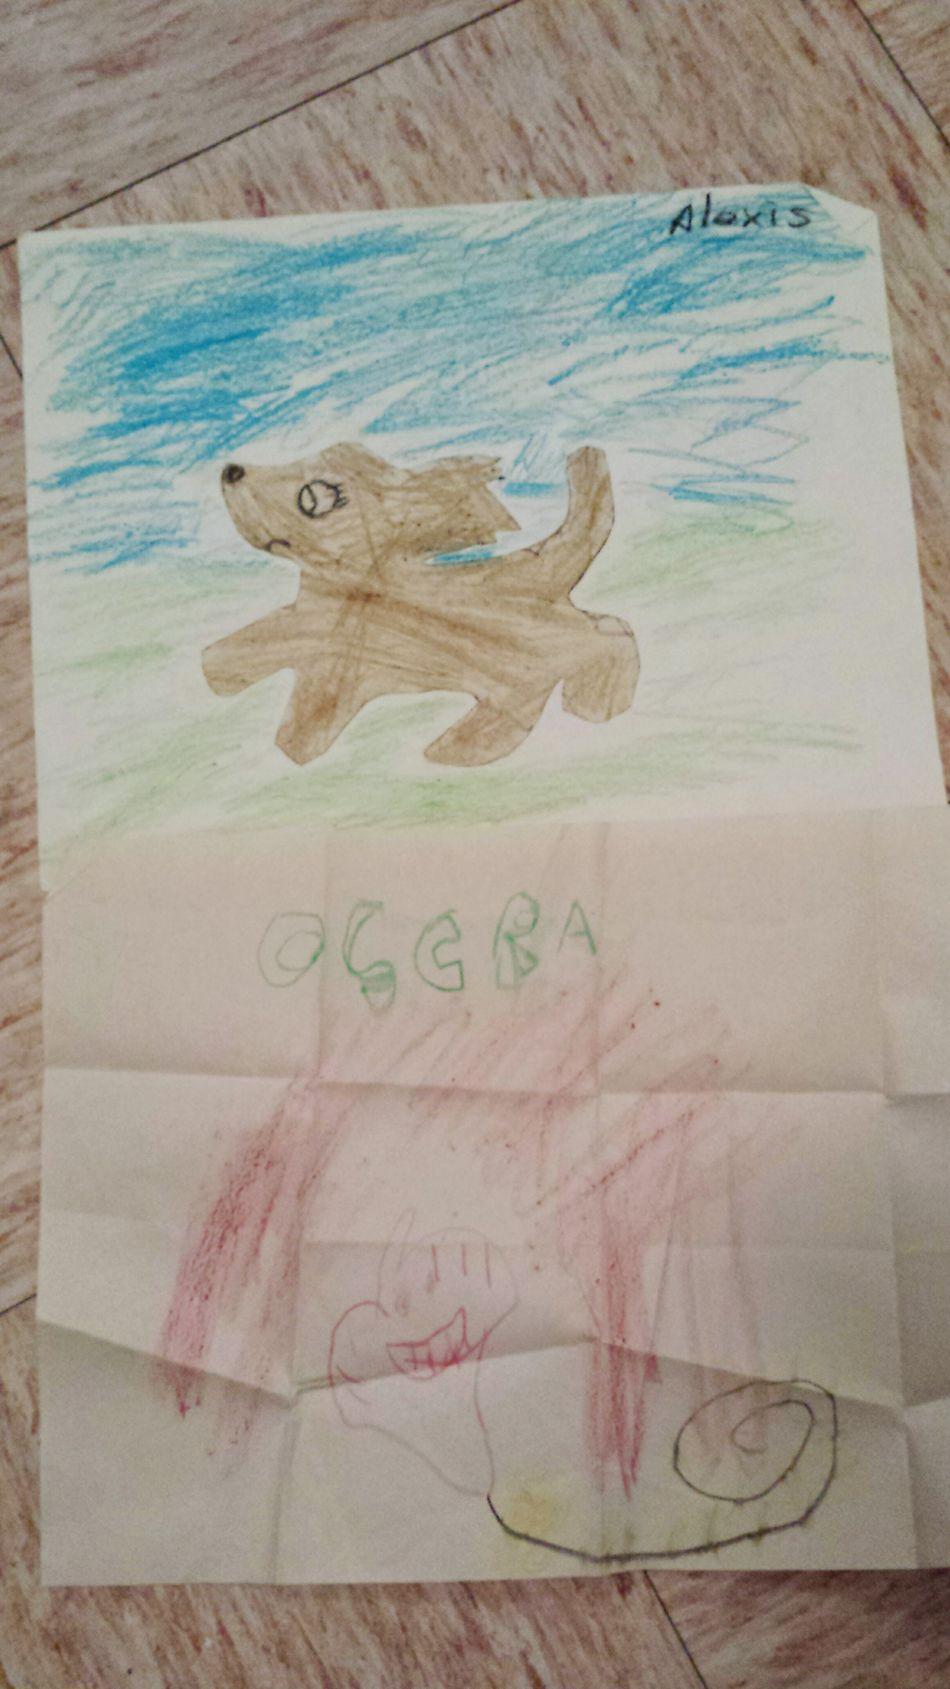 Yo soy el que no sabe dibujar. Art, Drawing, Creativity Painting Kids Drawing Pure Talent